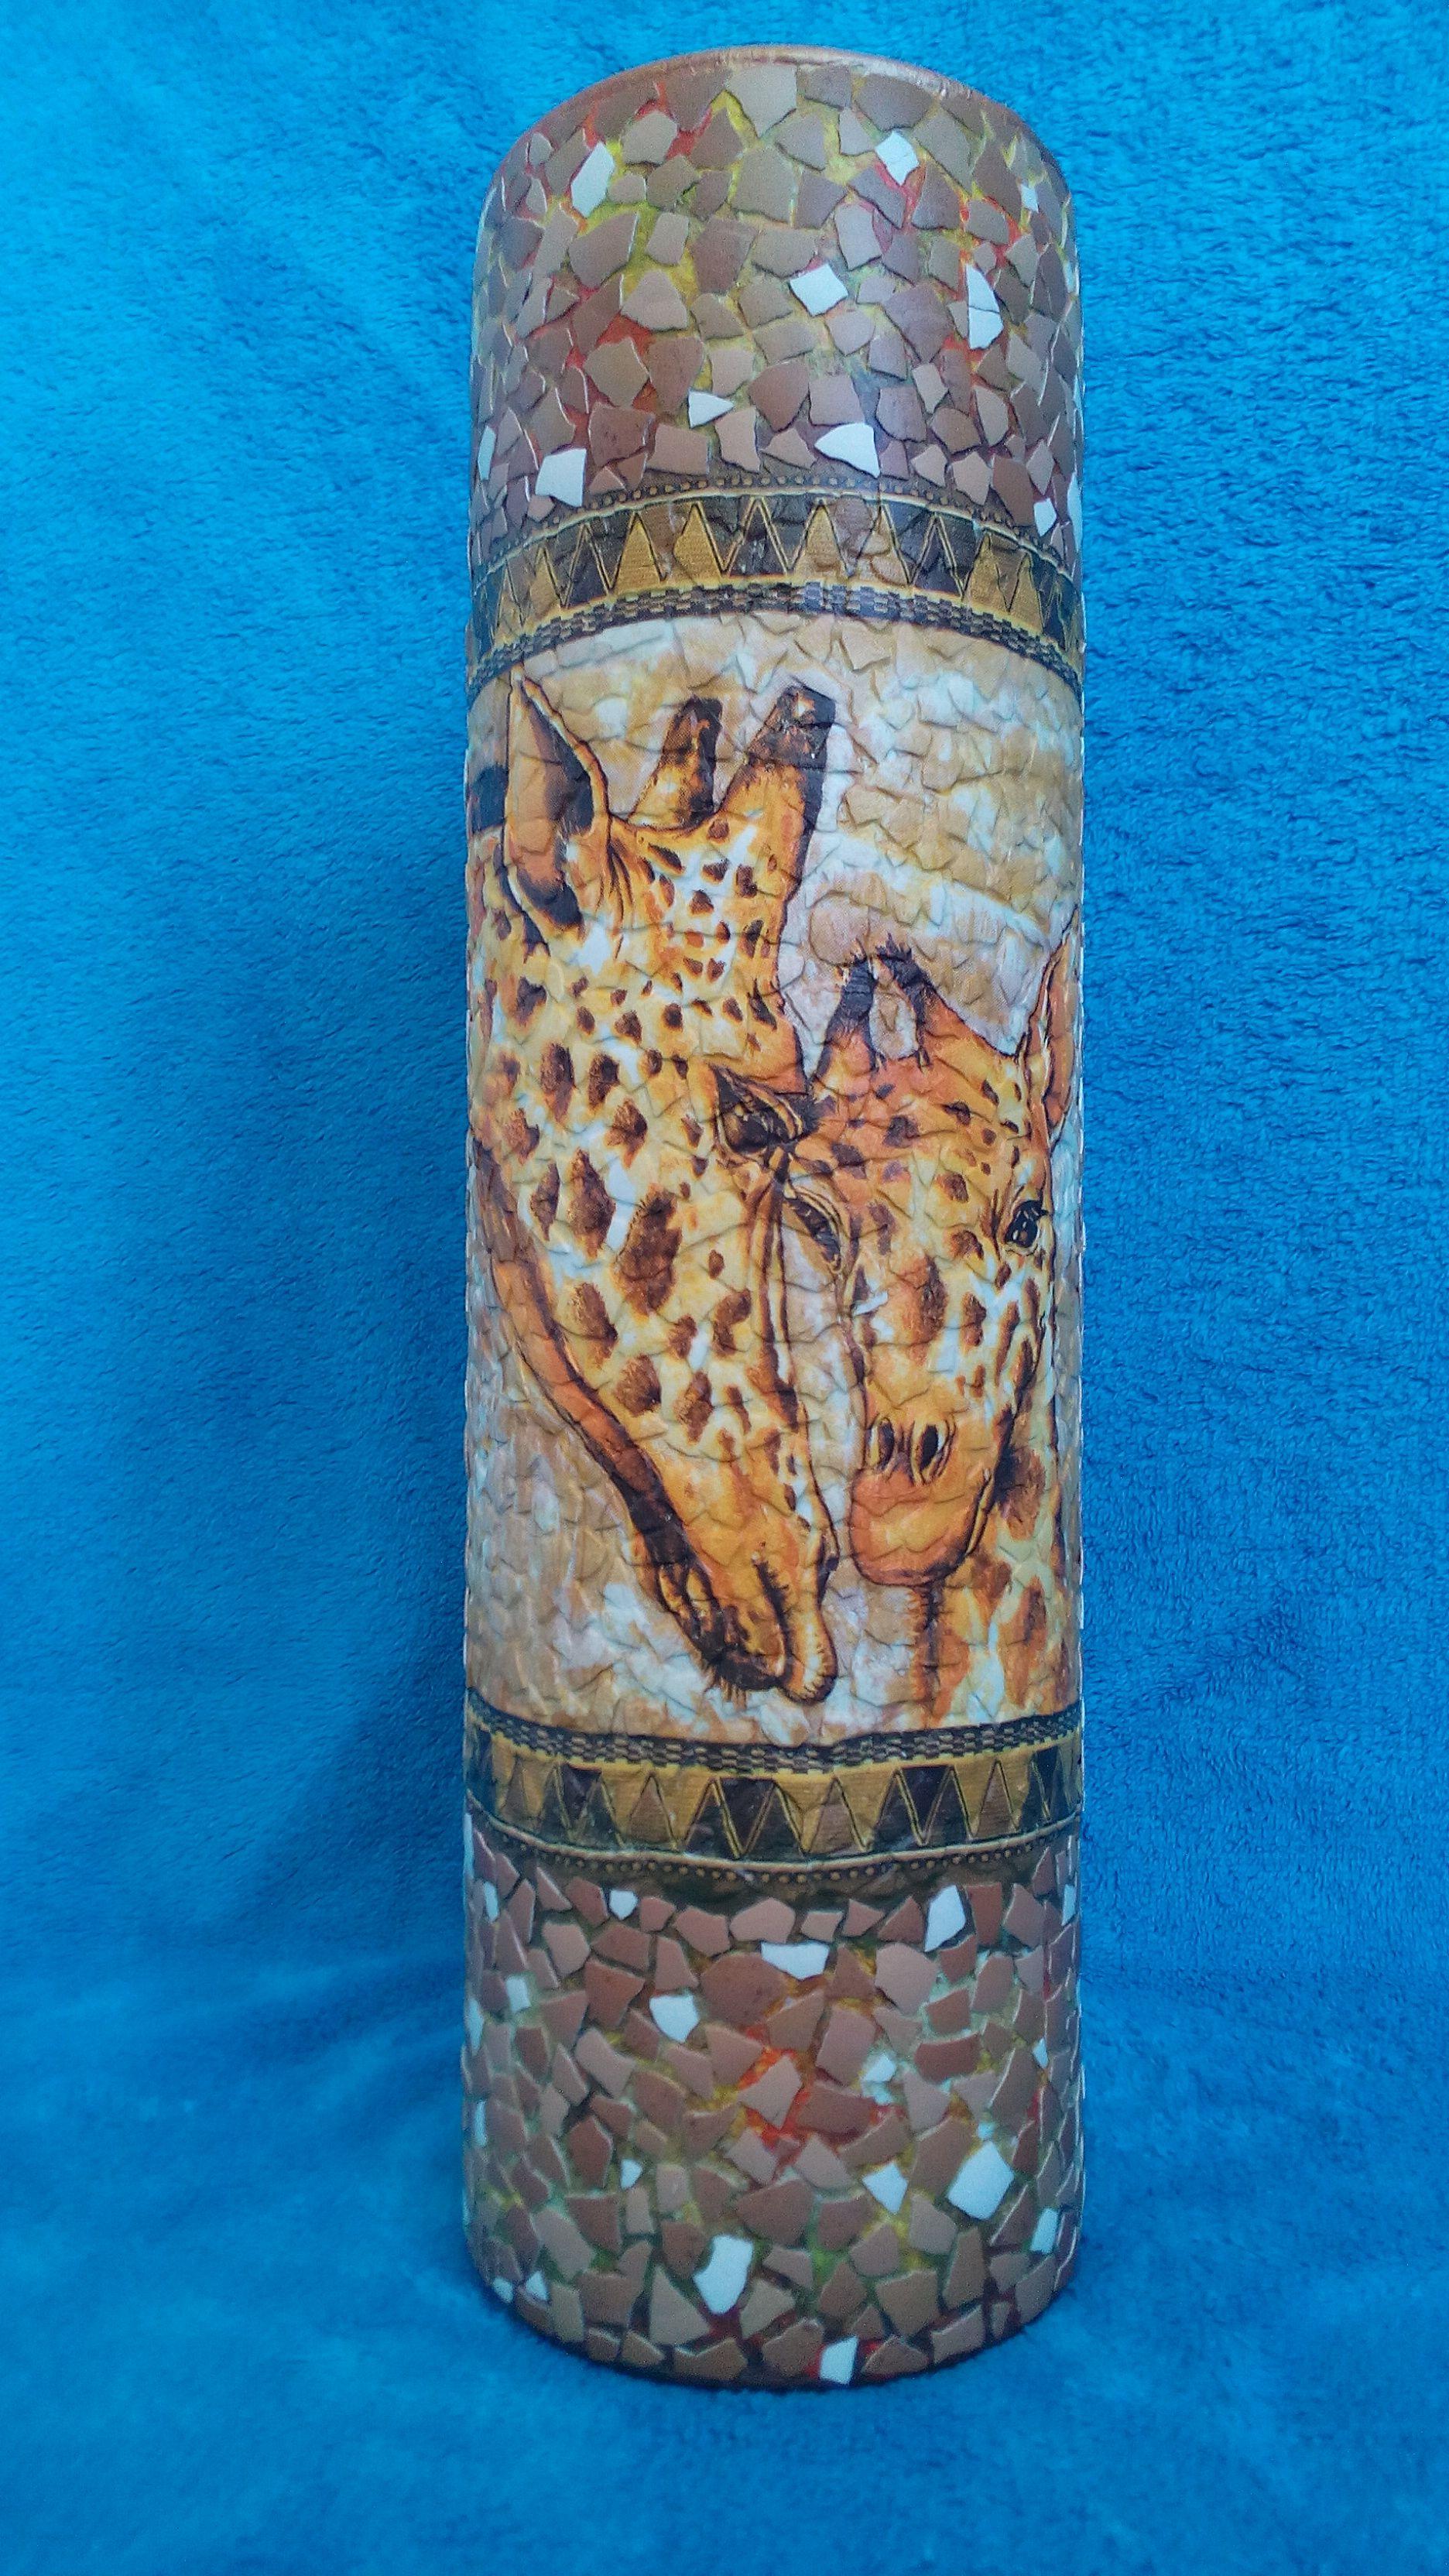 giraffe interior vase decoupage